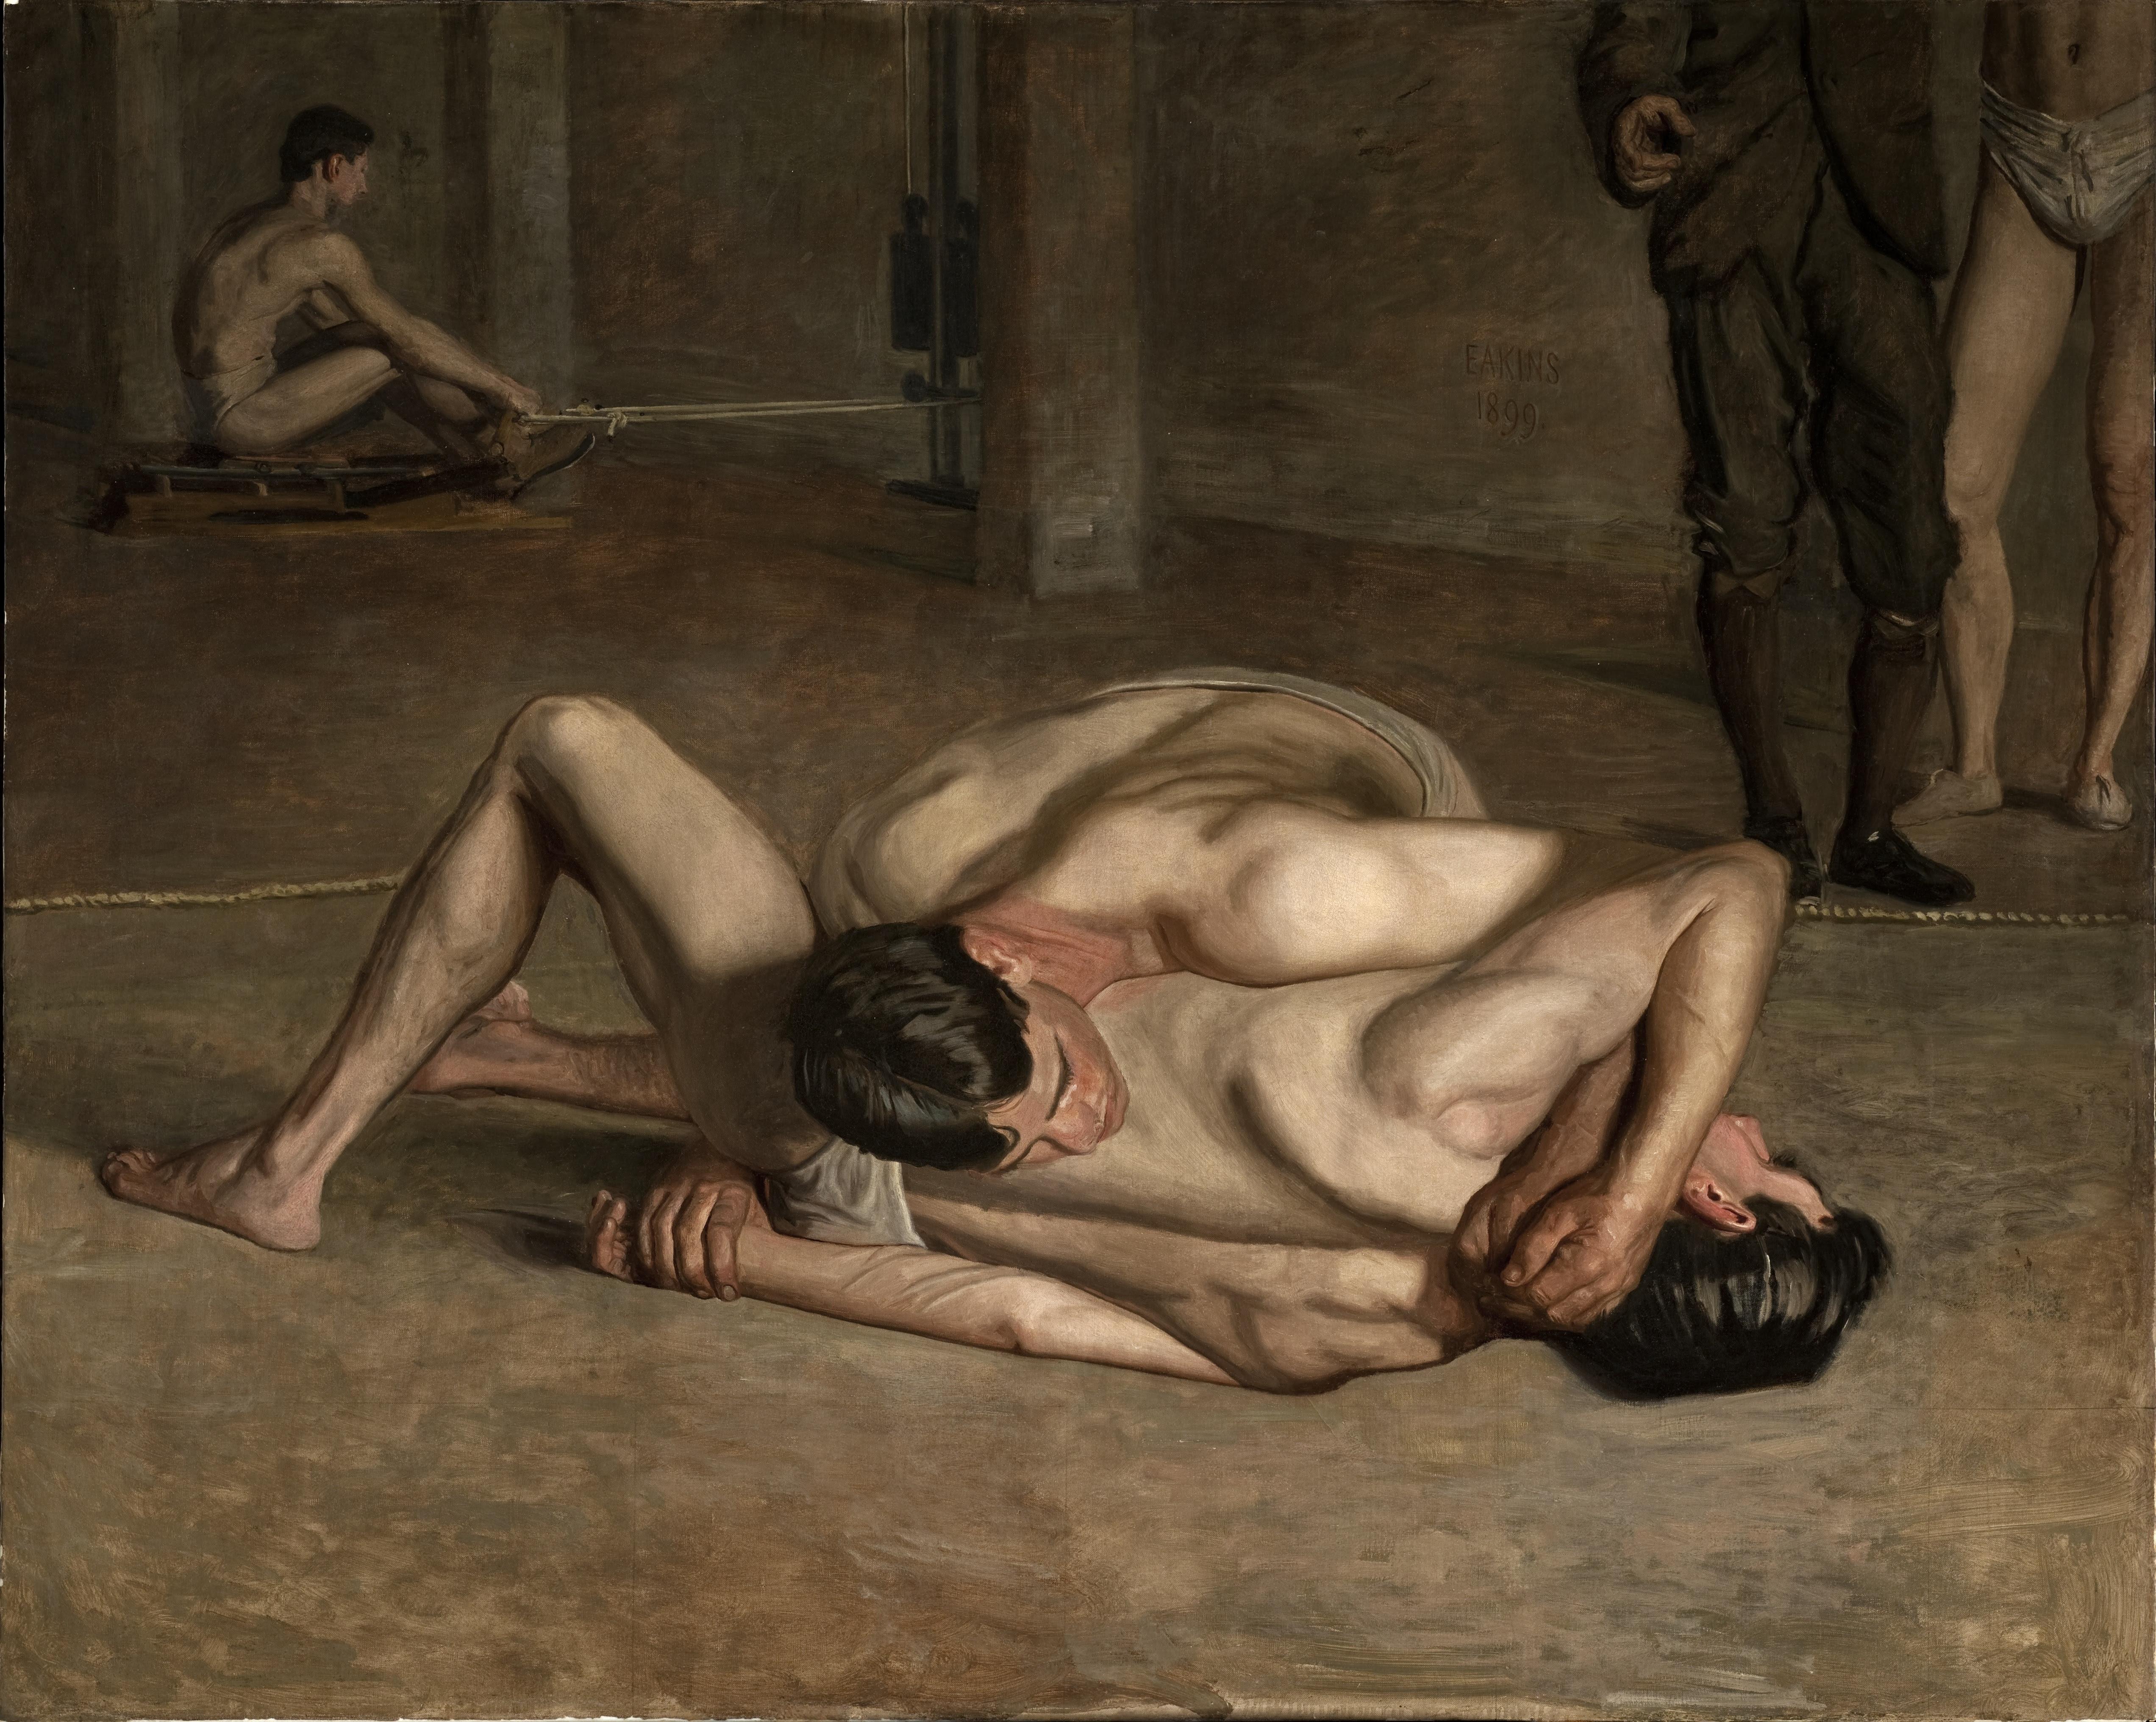 http://upload.wikimedia.org/wikipedia/commons/d/d3/Eakins%2C_Thomas_%281844-1916%29_-_Lottatori_3.jpg